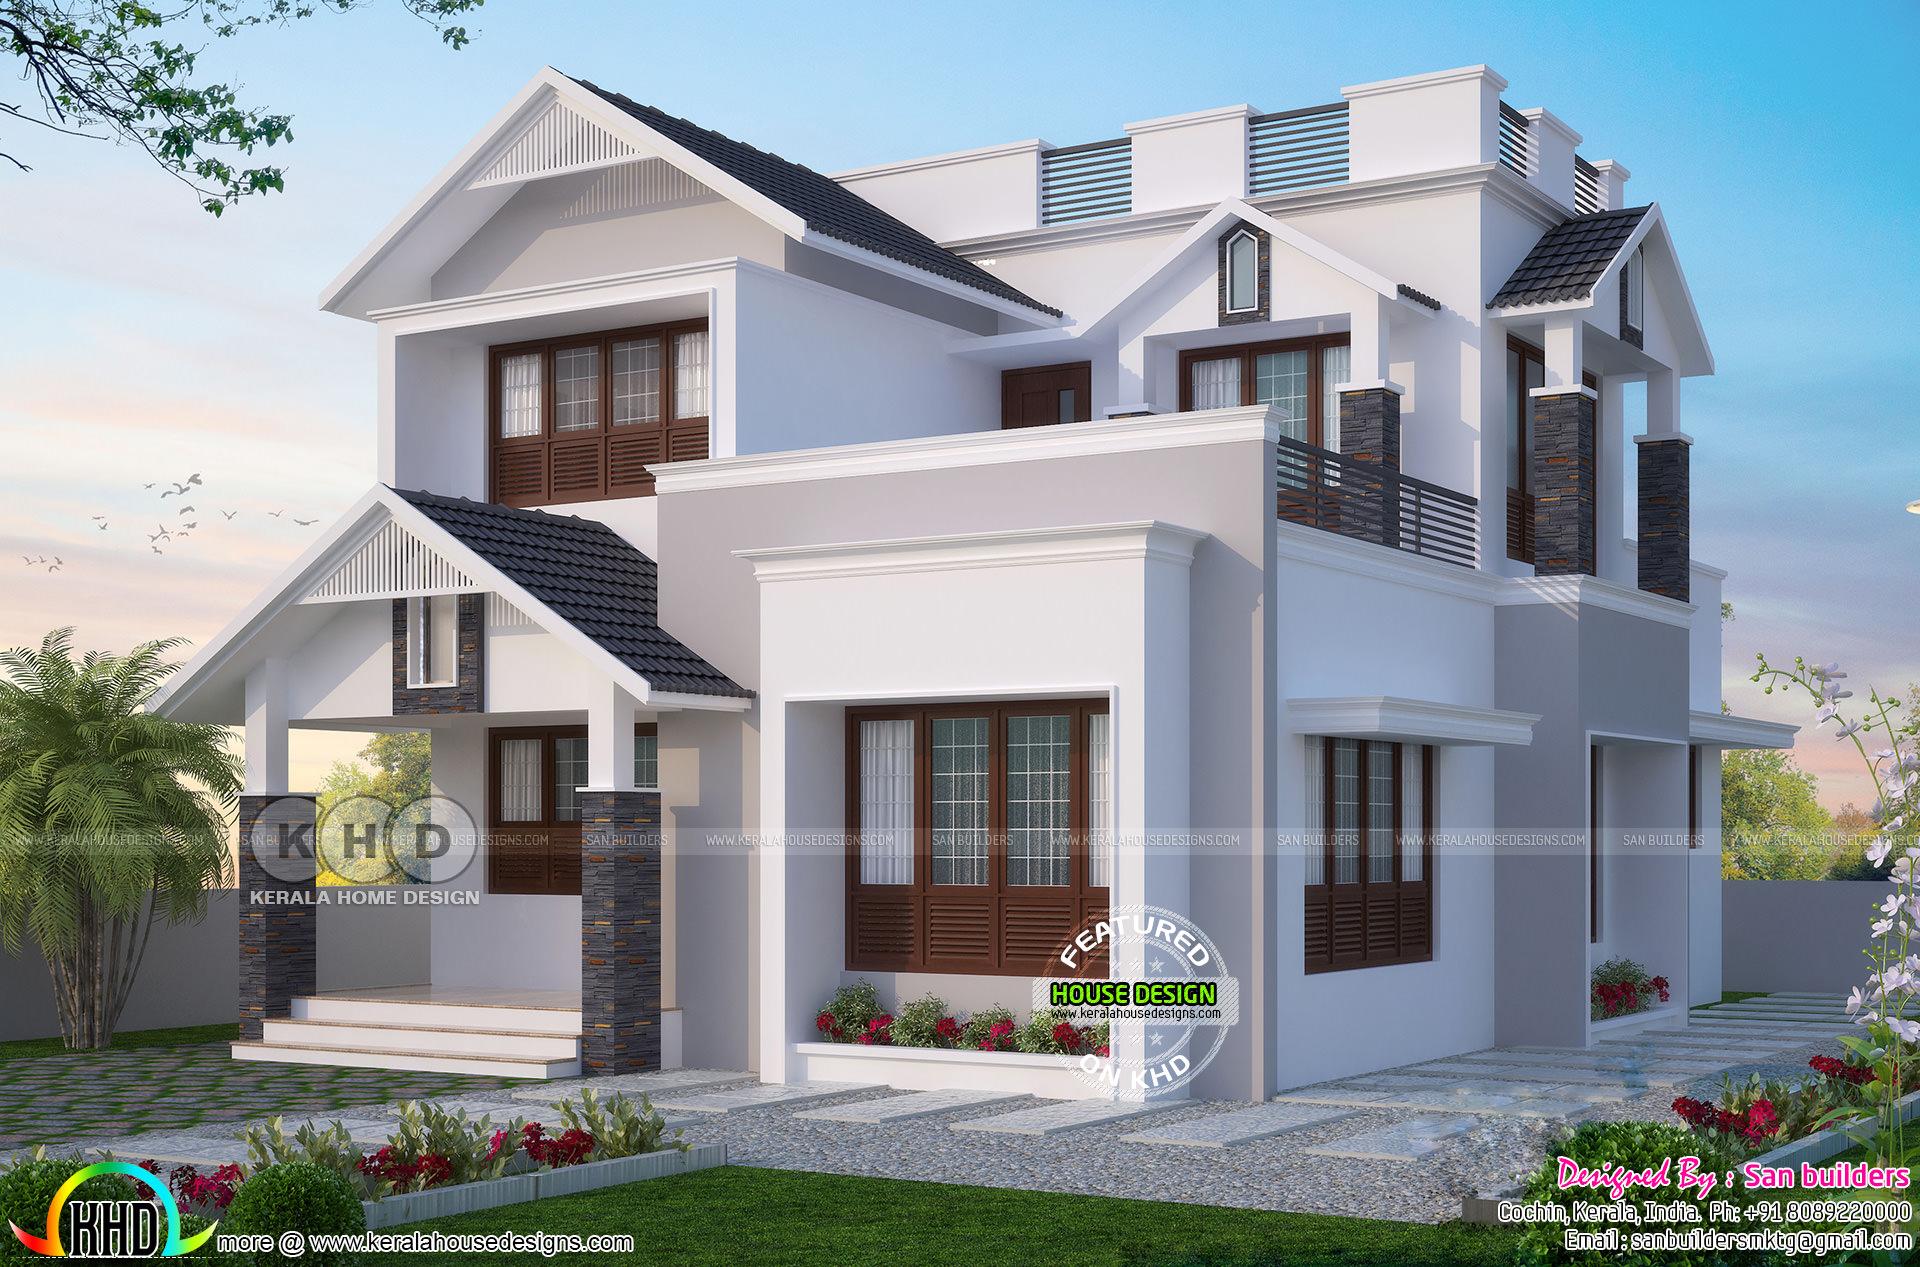 1596 Square Feet 4 Bedroom Modern Sloped Roof House Kerala